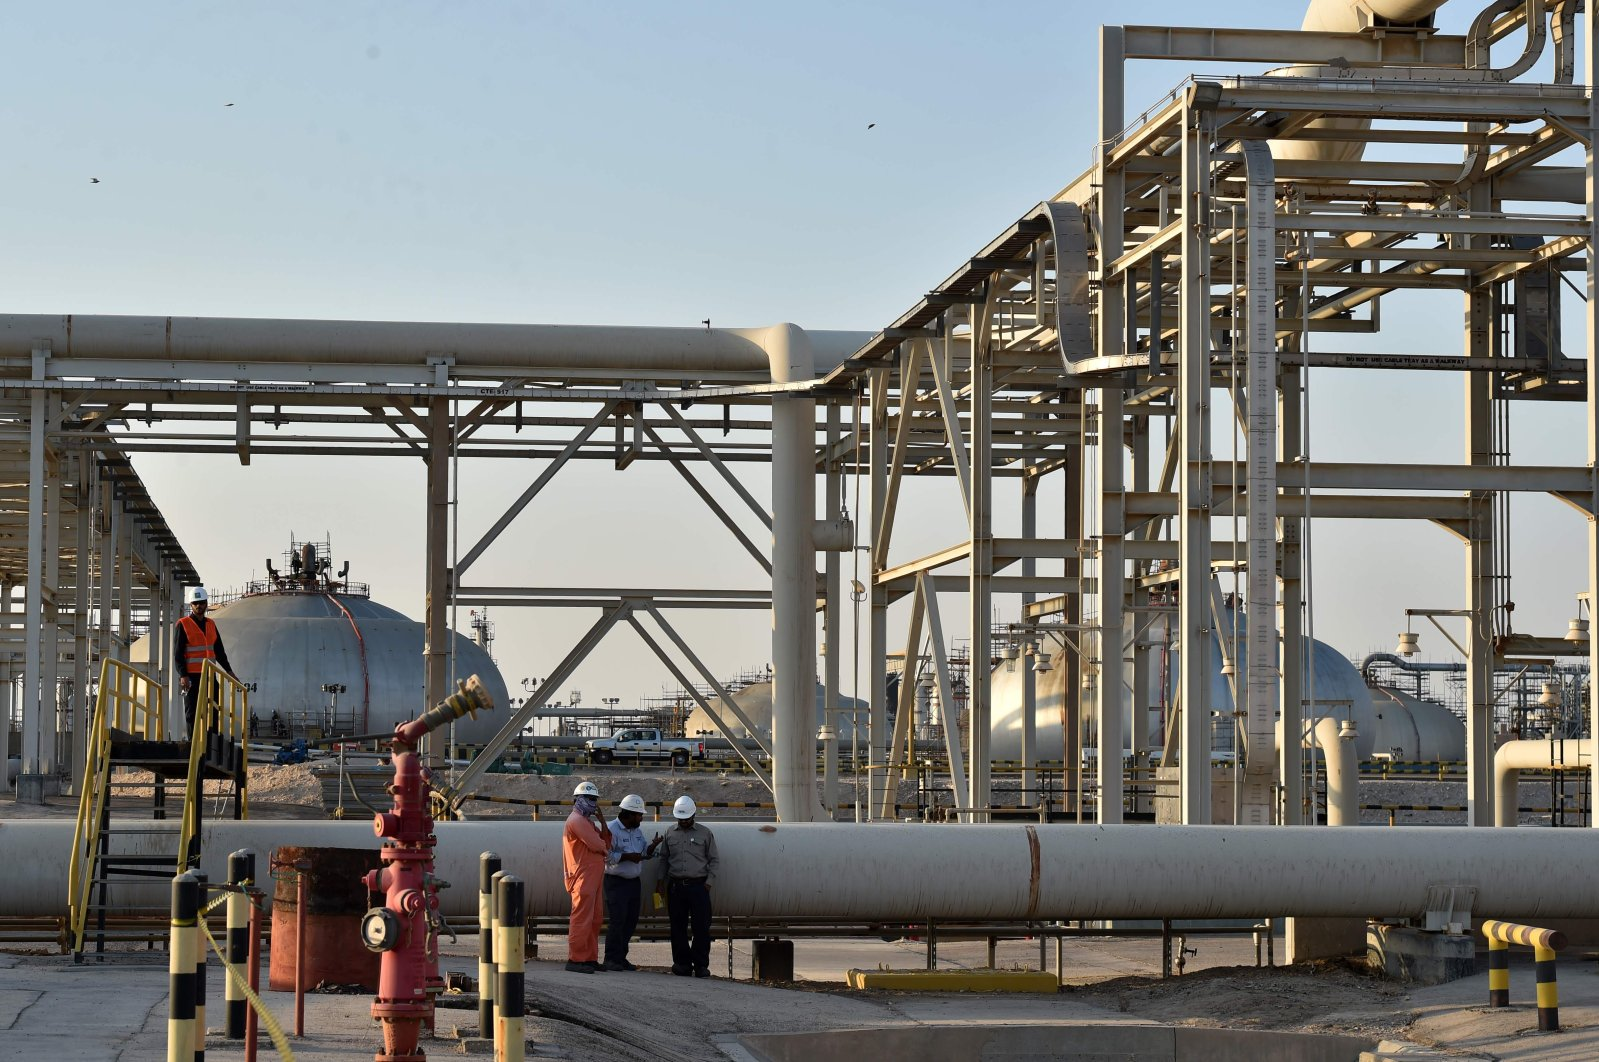 A partial view of Saudi Aramco's Abqaiq oil processing plant, Eastern Province, Saudi Arabia, Sept. 20, 2019. (AFP Photo)